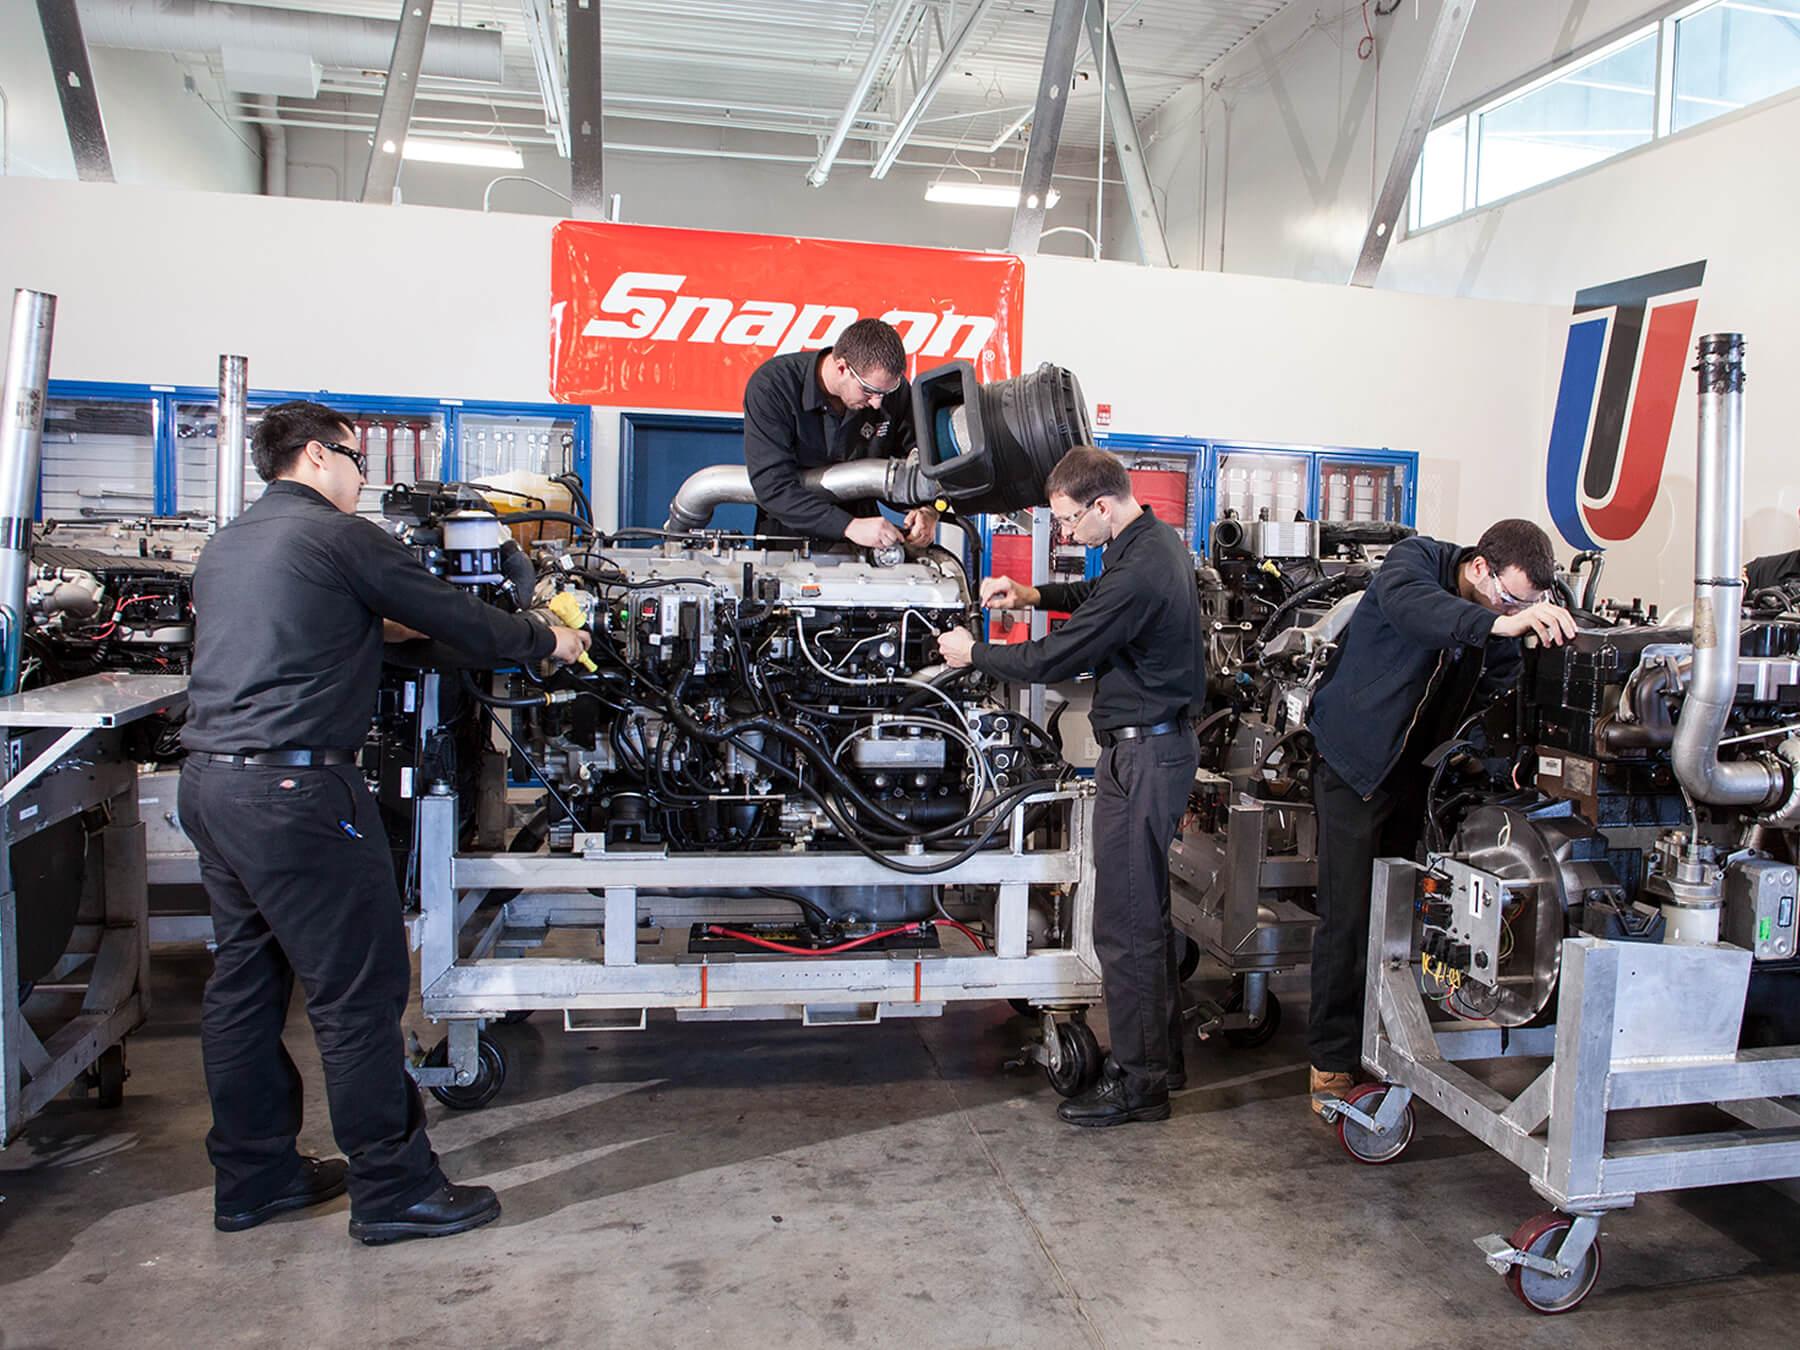 UTI students working on engines in the International Diesel lab